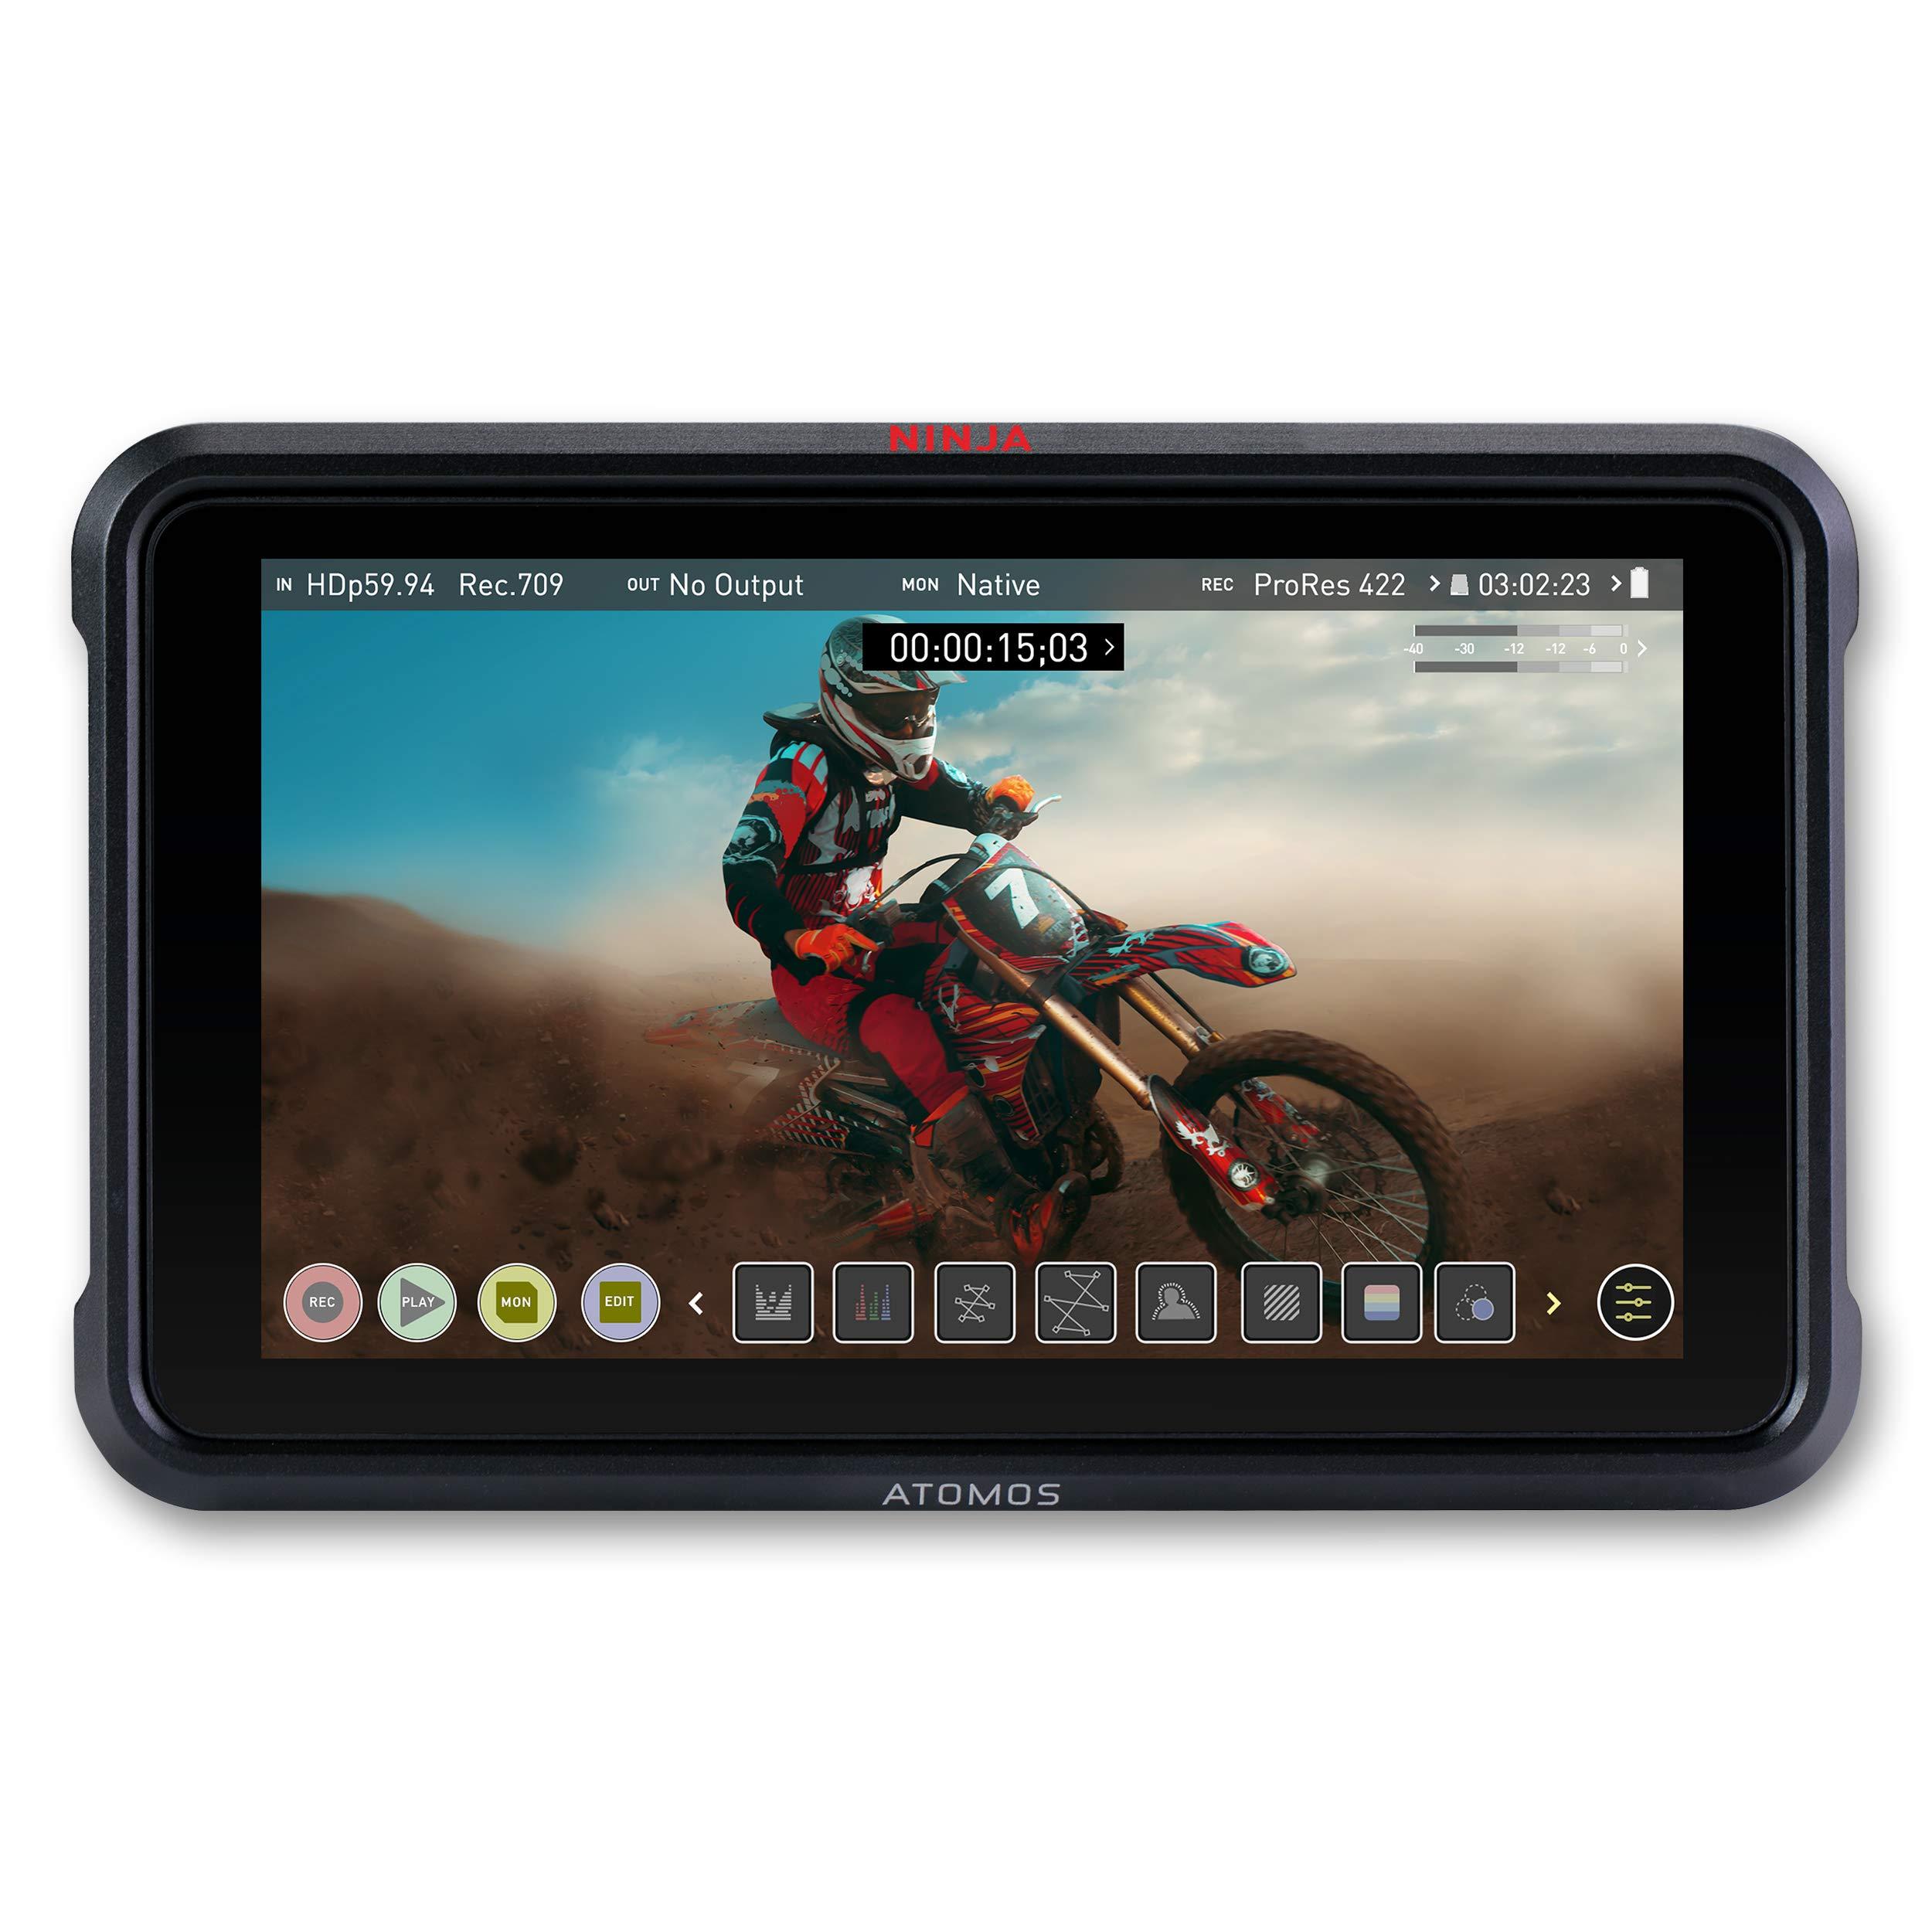 Atomos Ninja V Atomos Ninja V 4Kp60 10bit HDR Daylight Viewable 1000nit Portable Monitor/Recorder ATOMNJAV01 by Atomos